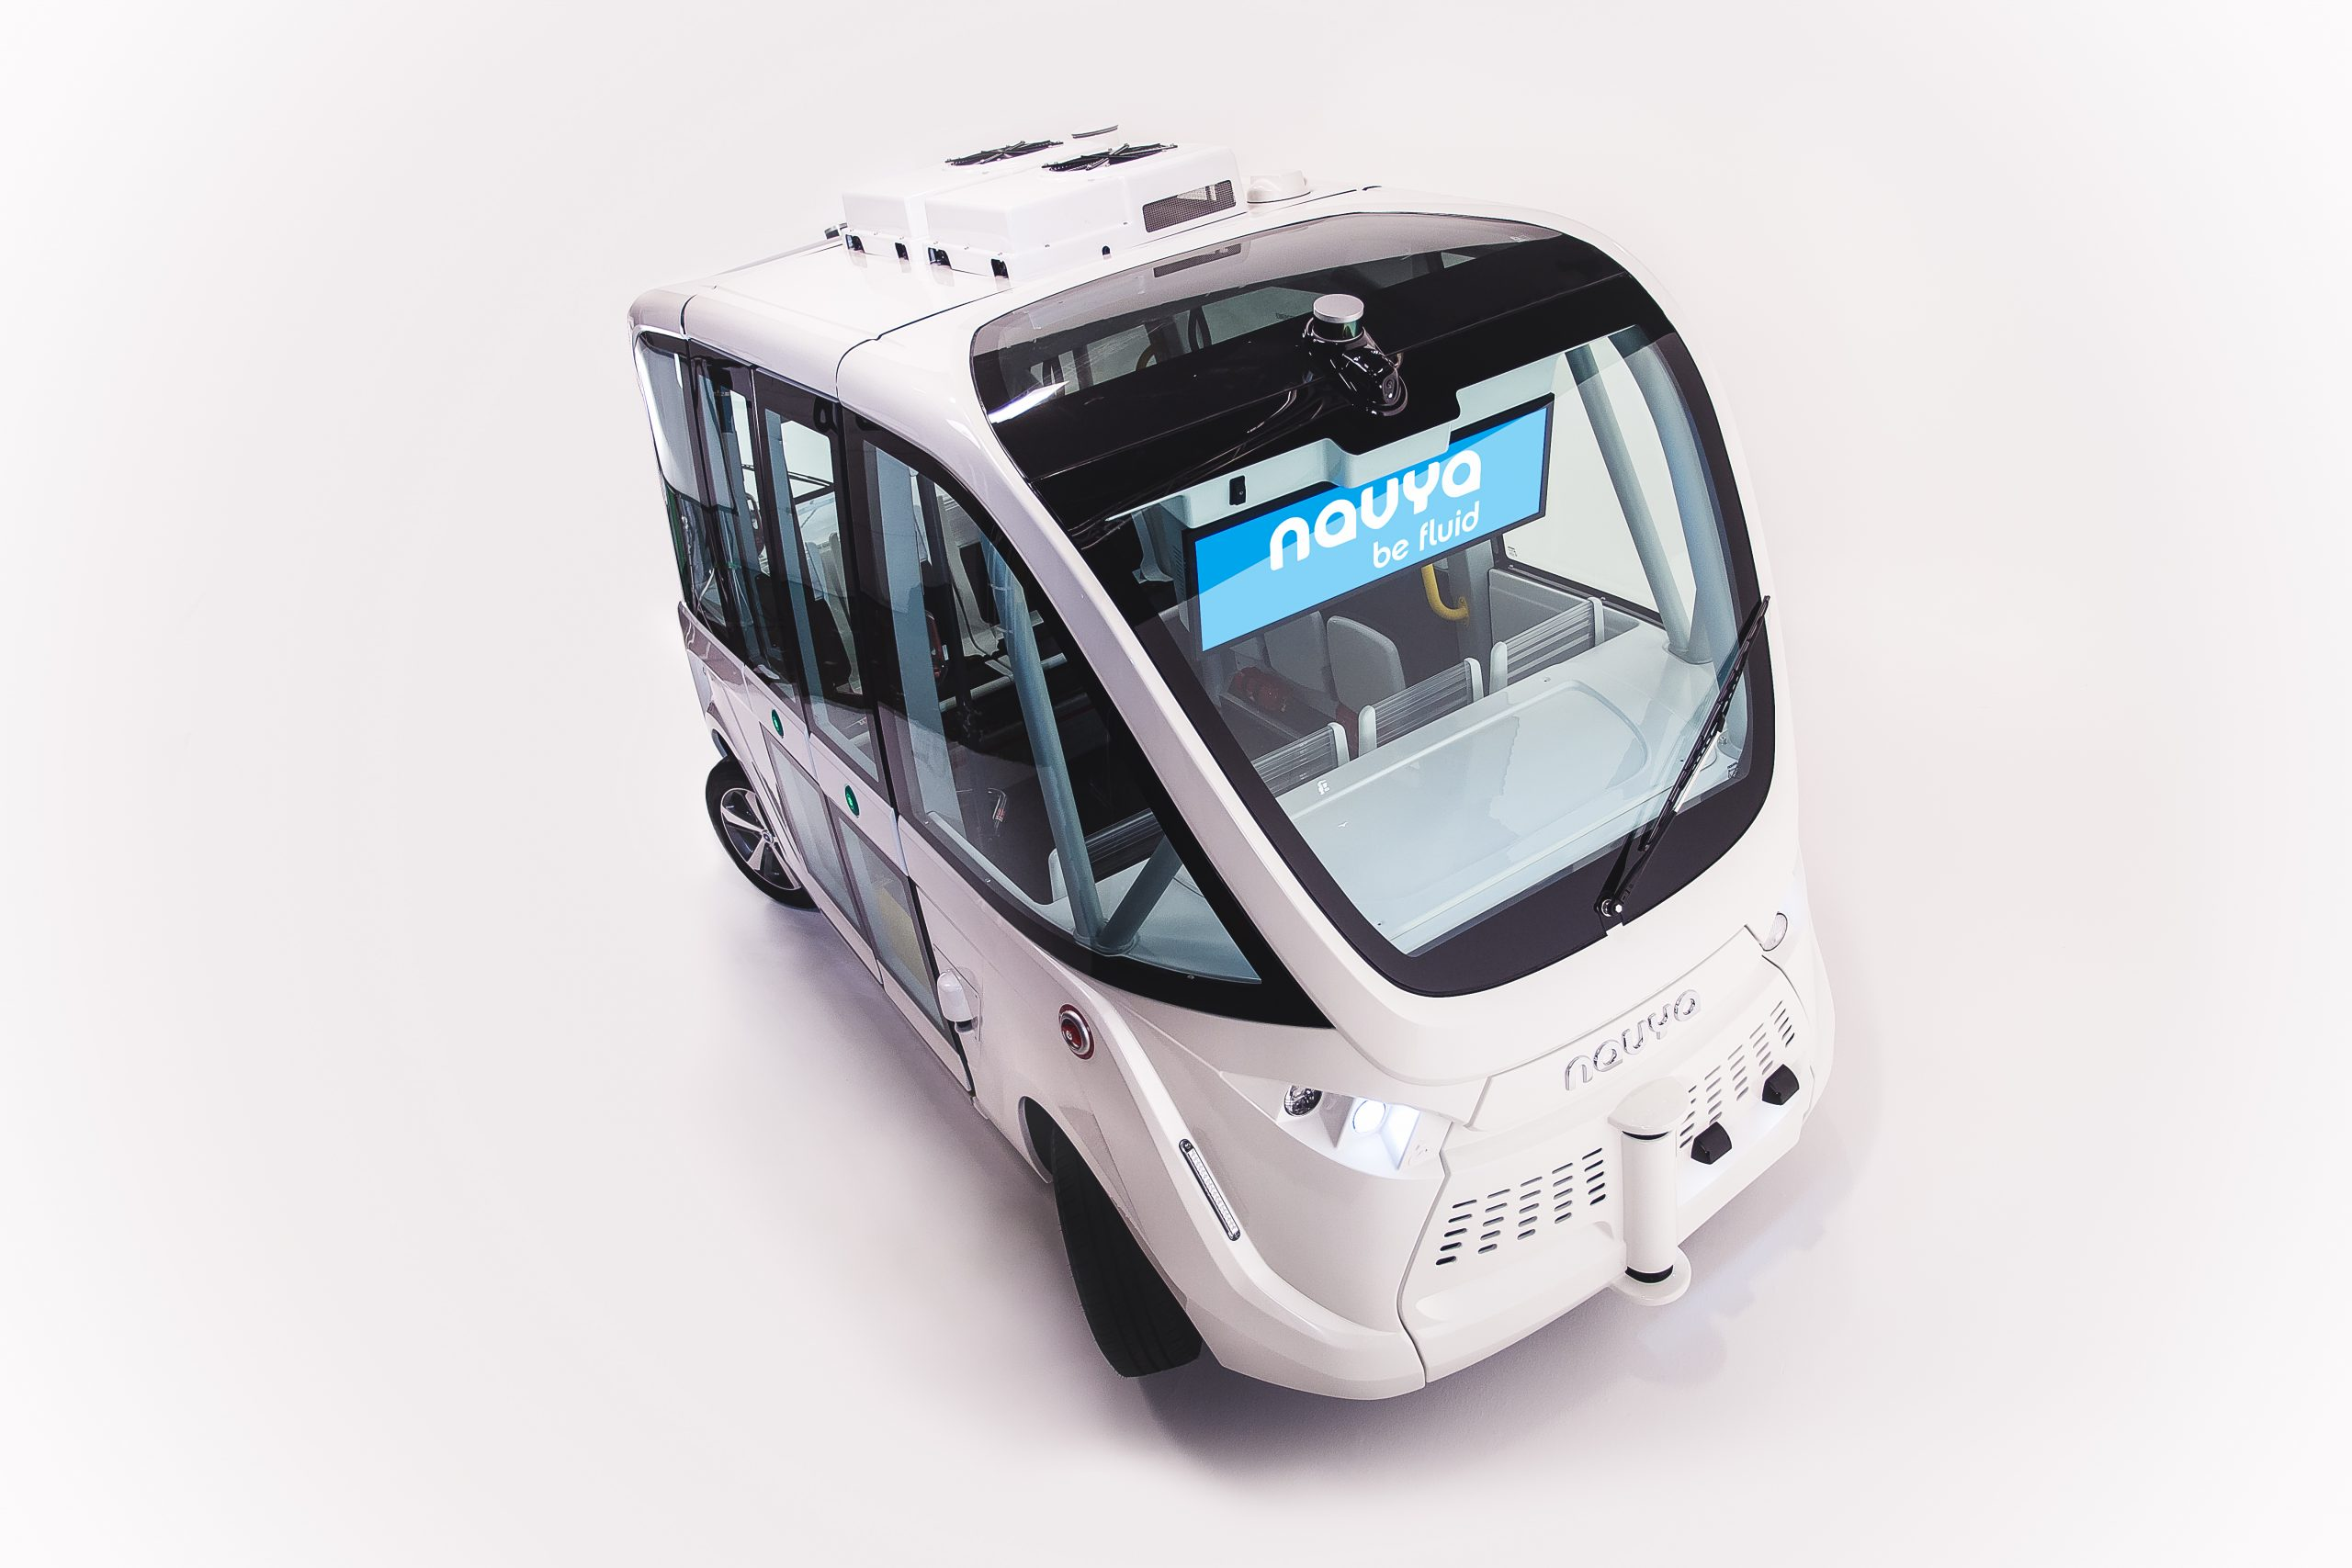 Autonome Busse- teilweise Draufsicht